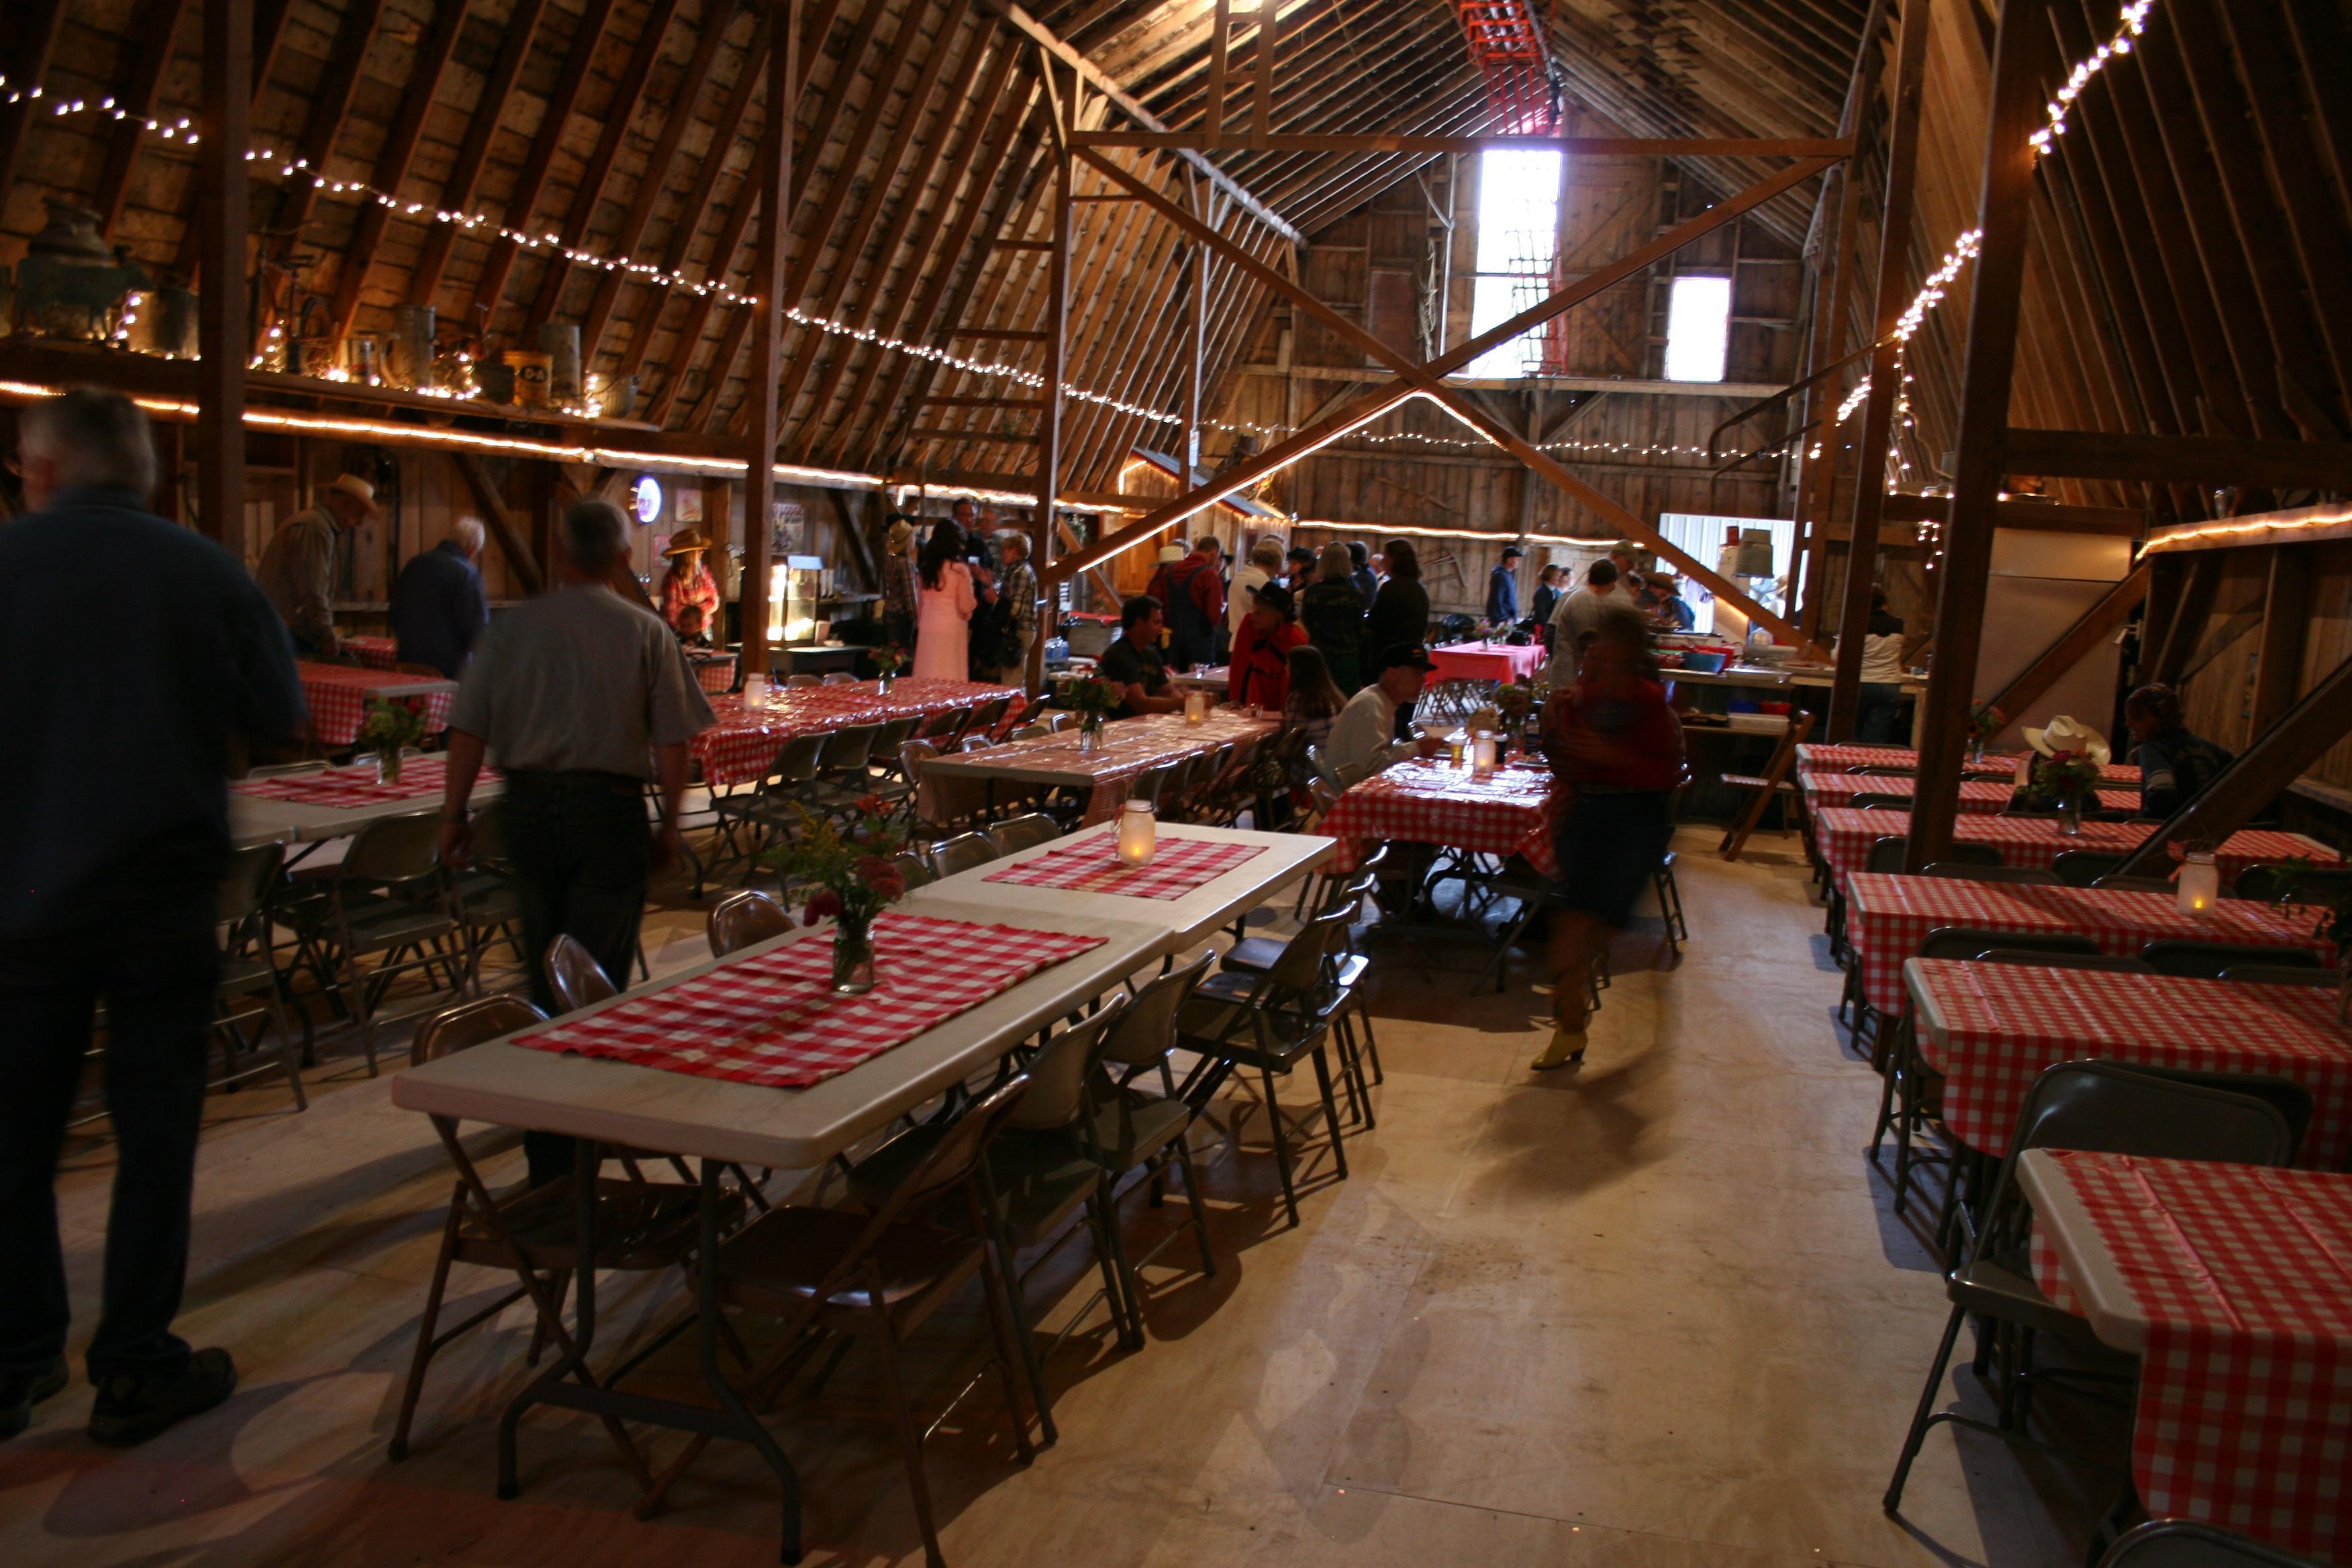 Barn Dance Minnesota Prairie Roots